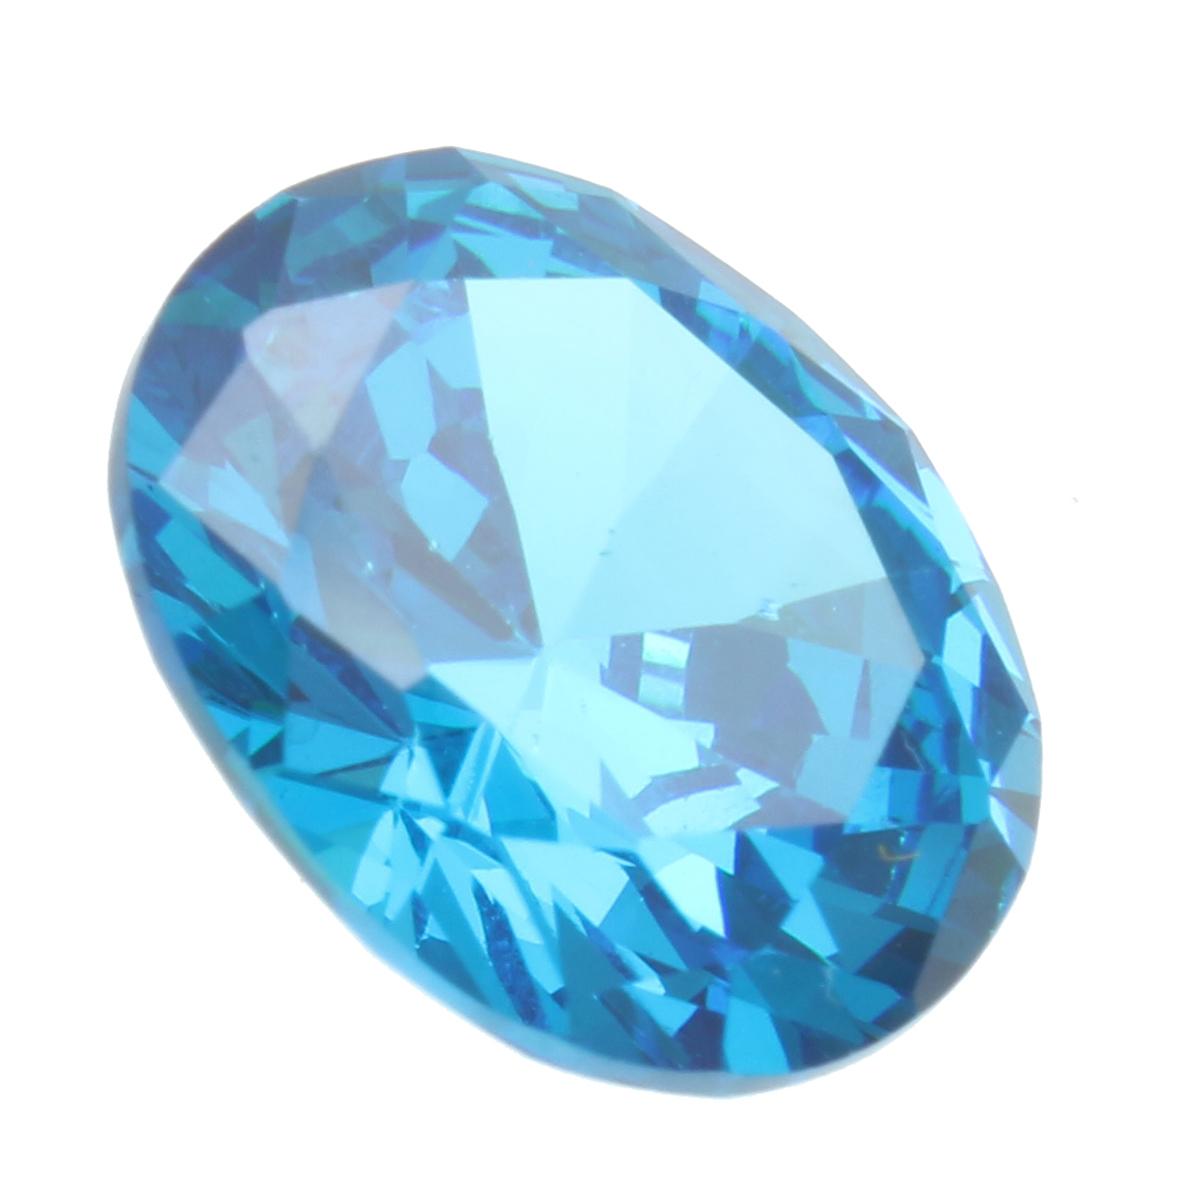 10x12mm Diamond Oval Light Blue Artificial Zircon Jewelry Diy Making Loose Gemstone Decoration Alexnld Com